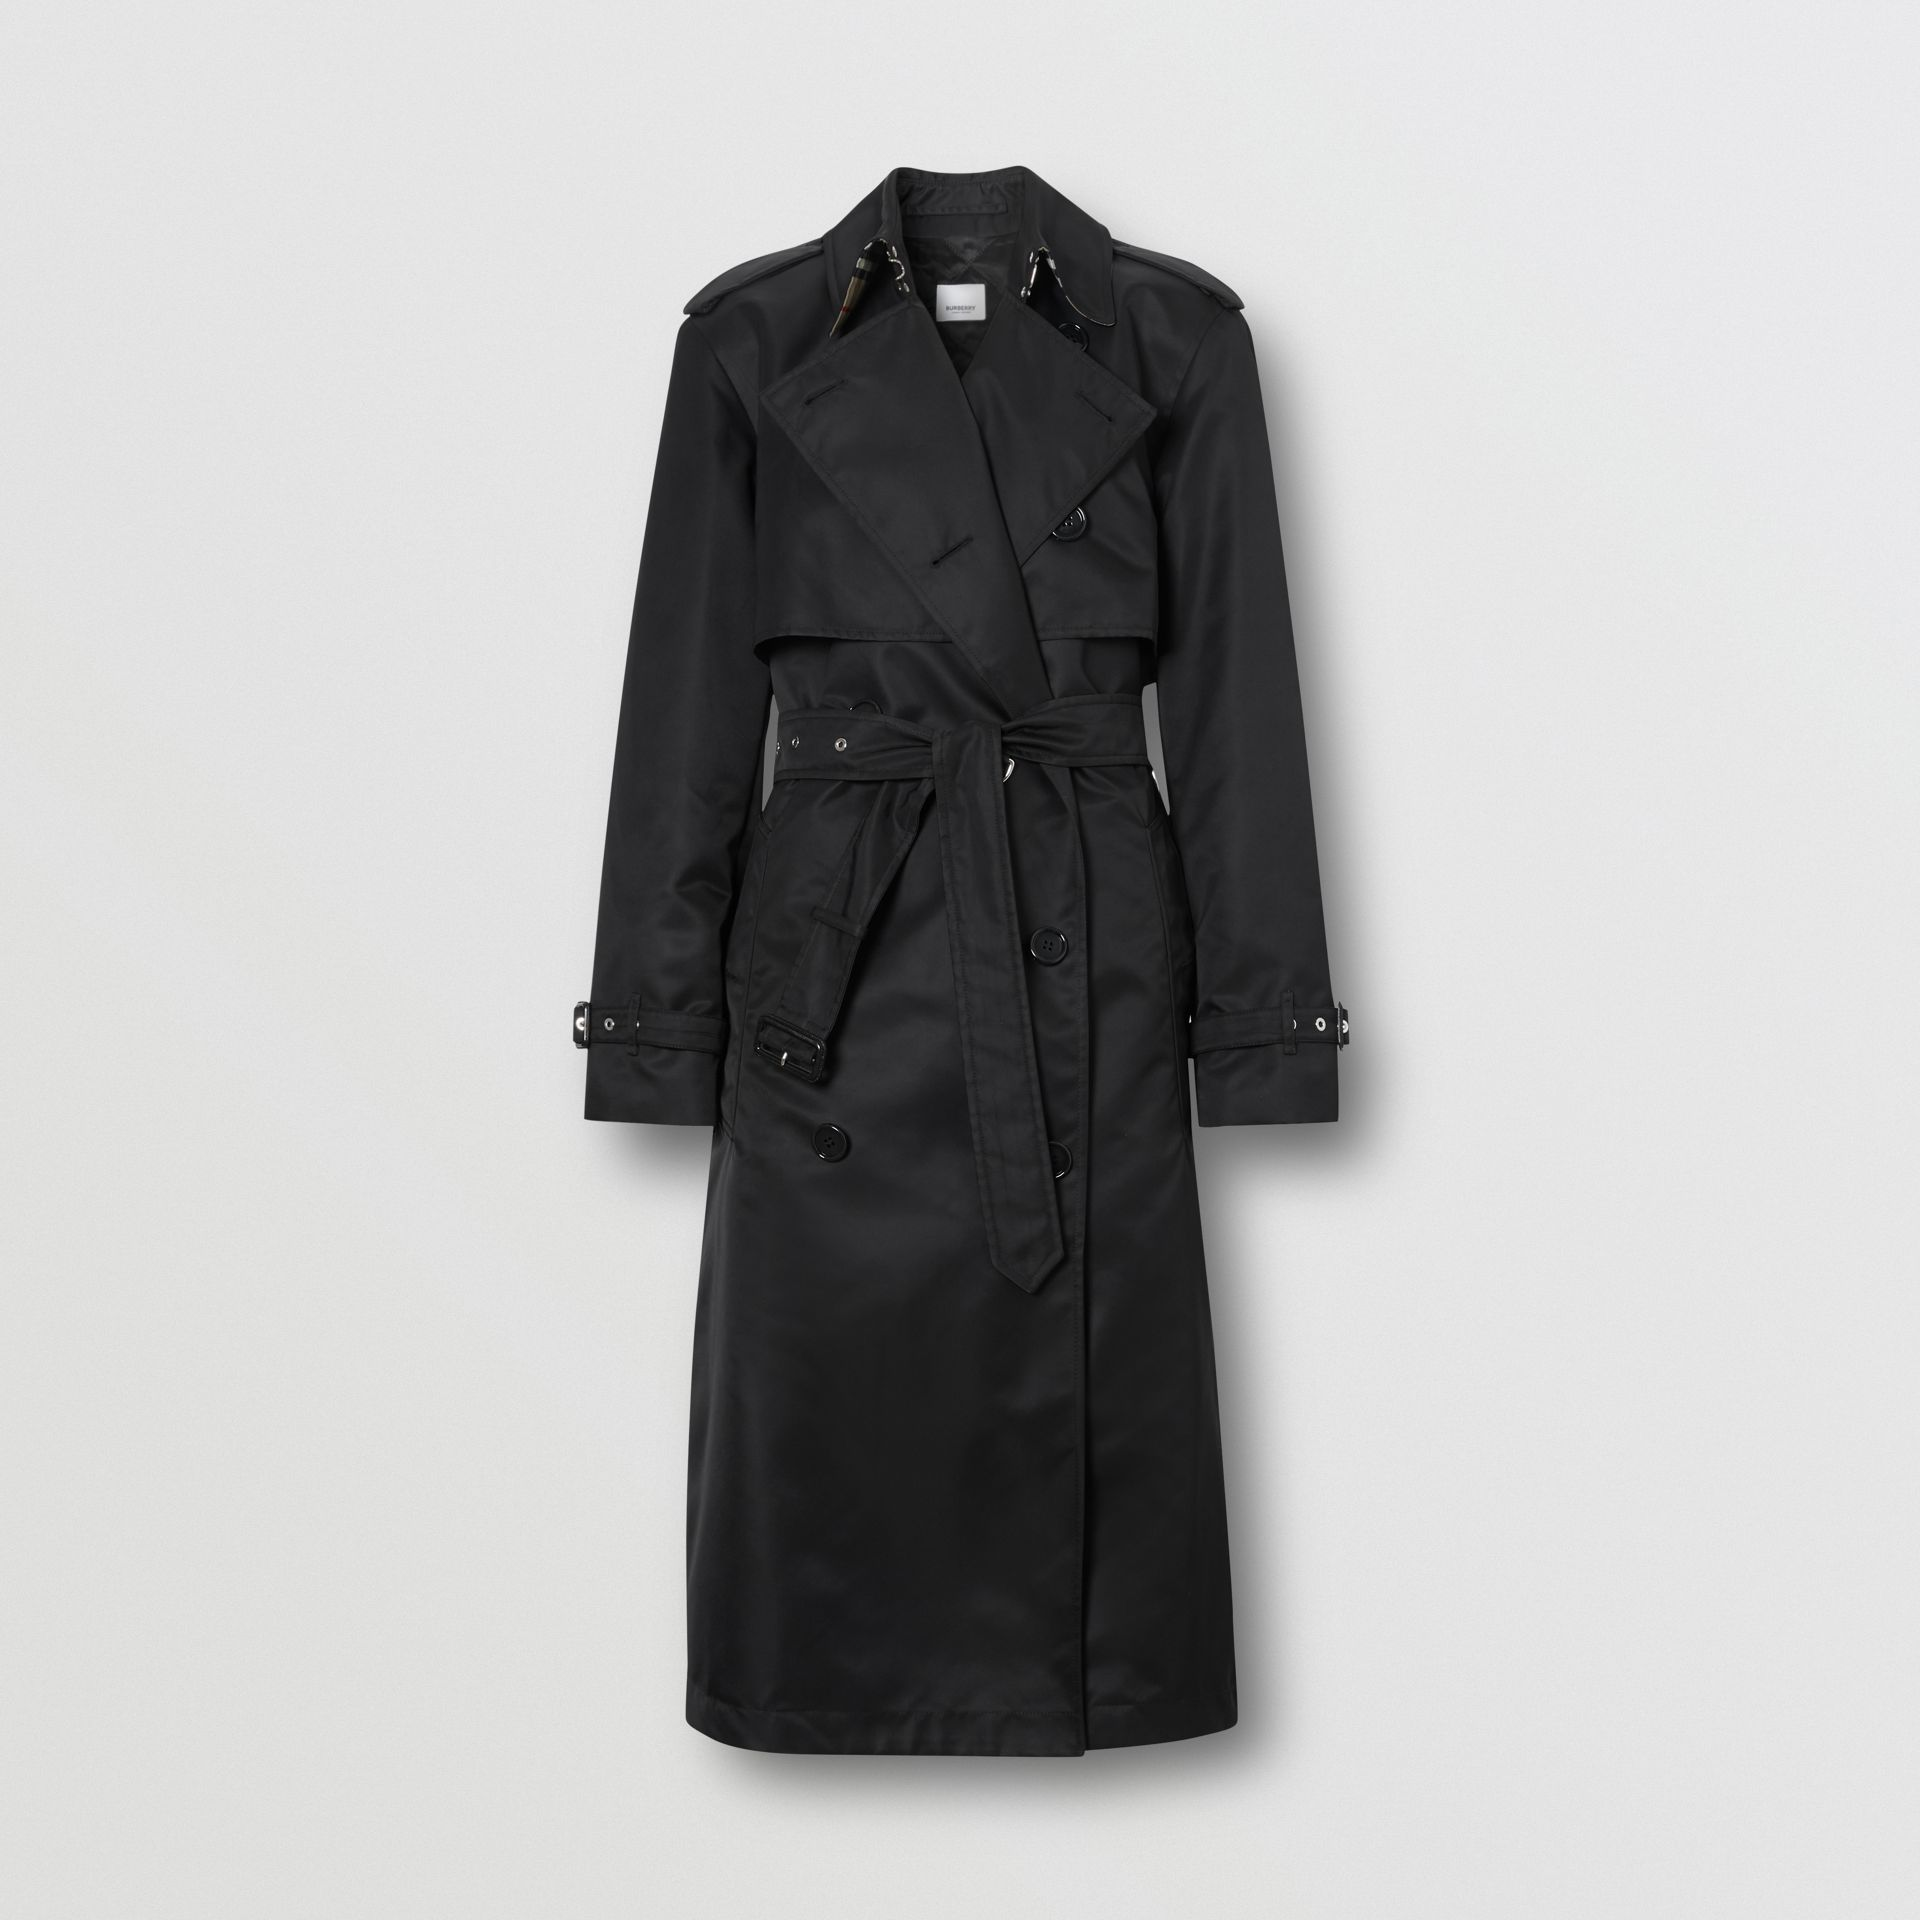 Nylon Twill Trench Coat in Black - Women | Burberry Australia - gallery image 3